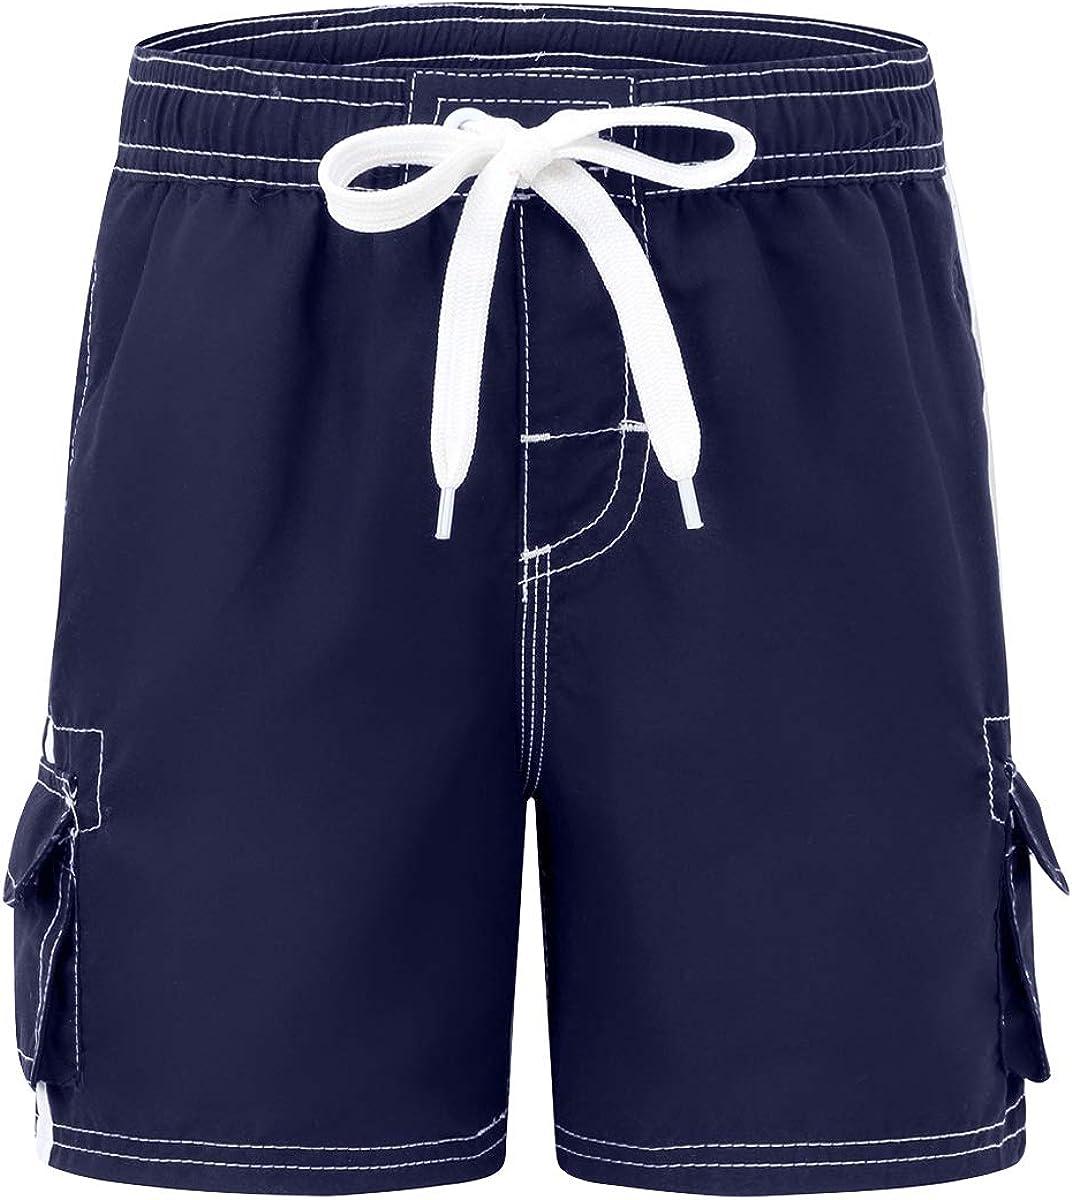 Amazon.com: Akula Boys' Quick Dry Swim Trunks Beach Board Shorts with Mesh  Lining: Clothing